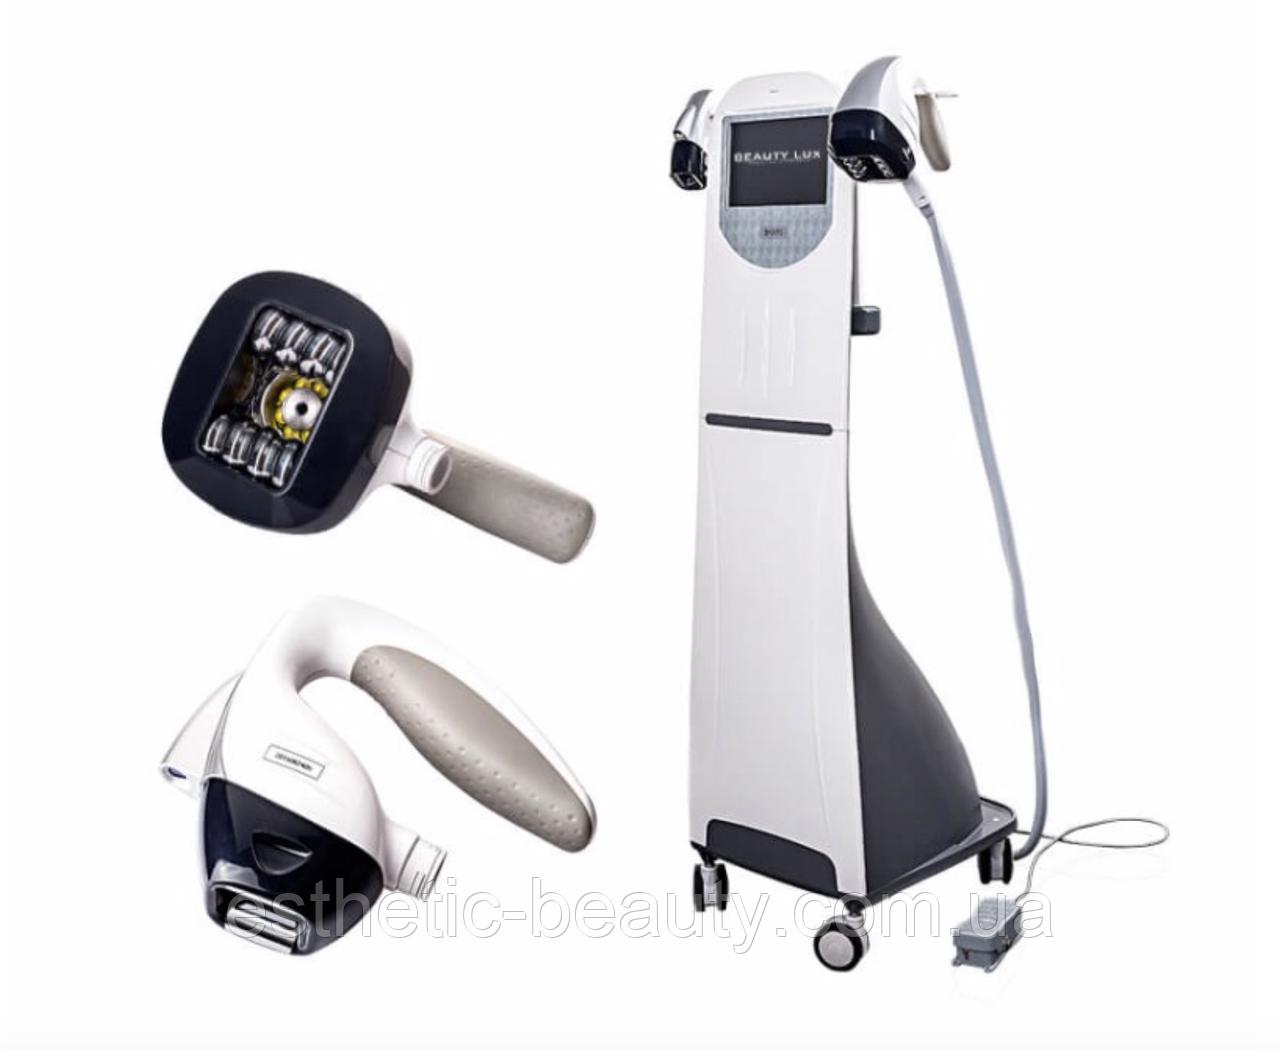 Аппарат для вакуумно-роликового массажа BEAUTY LUX VelaShape 3000